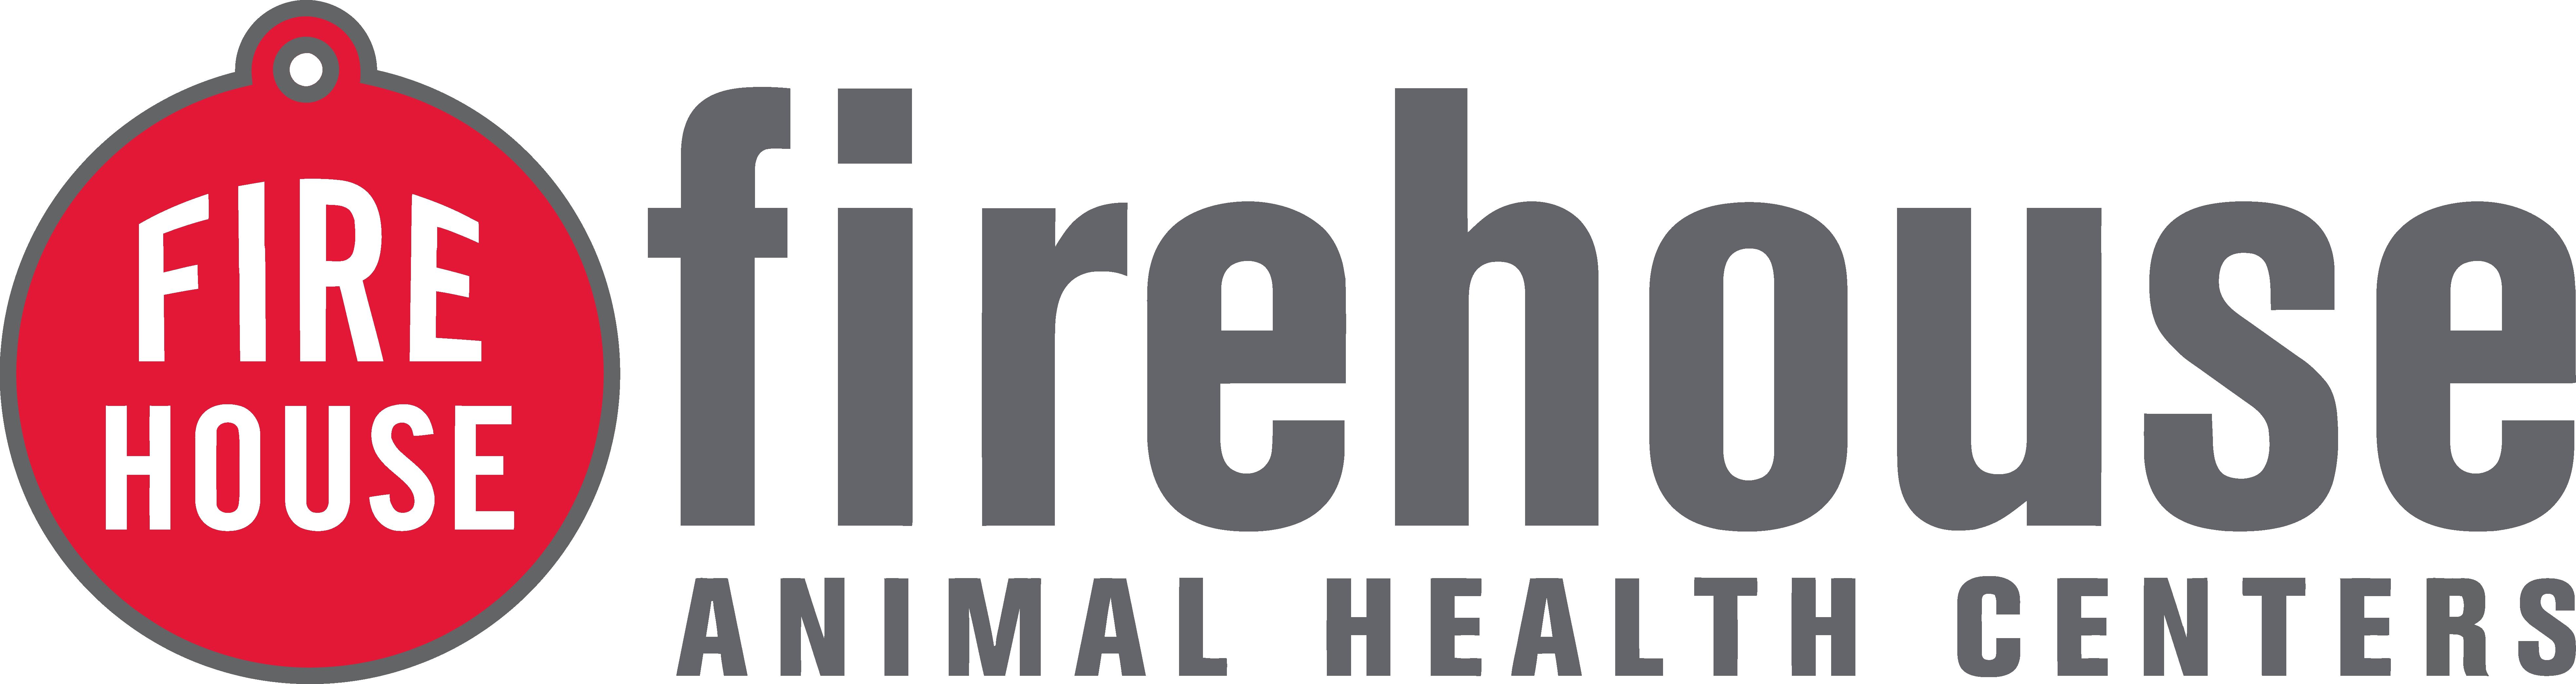 Firehouse Animal Health Centers